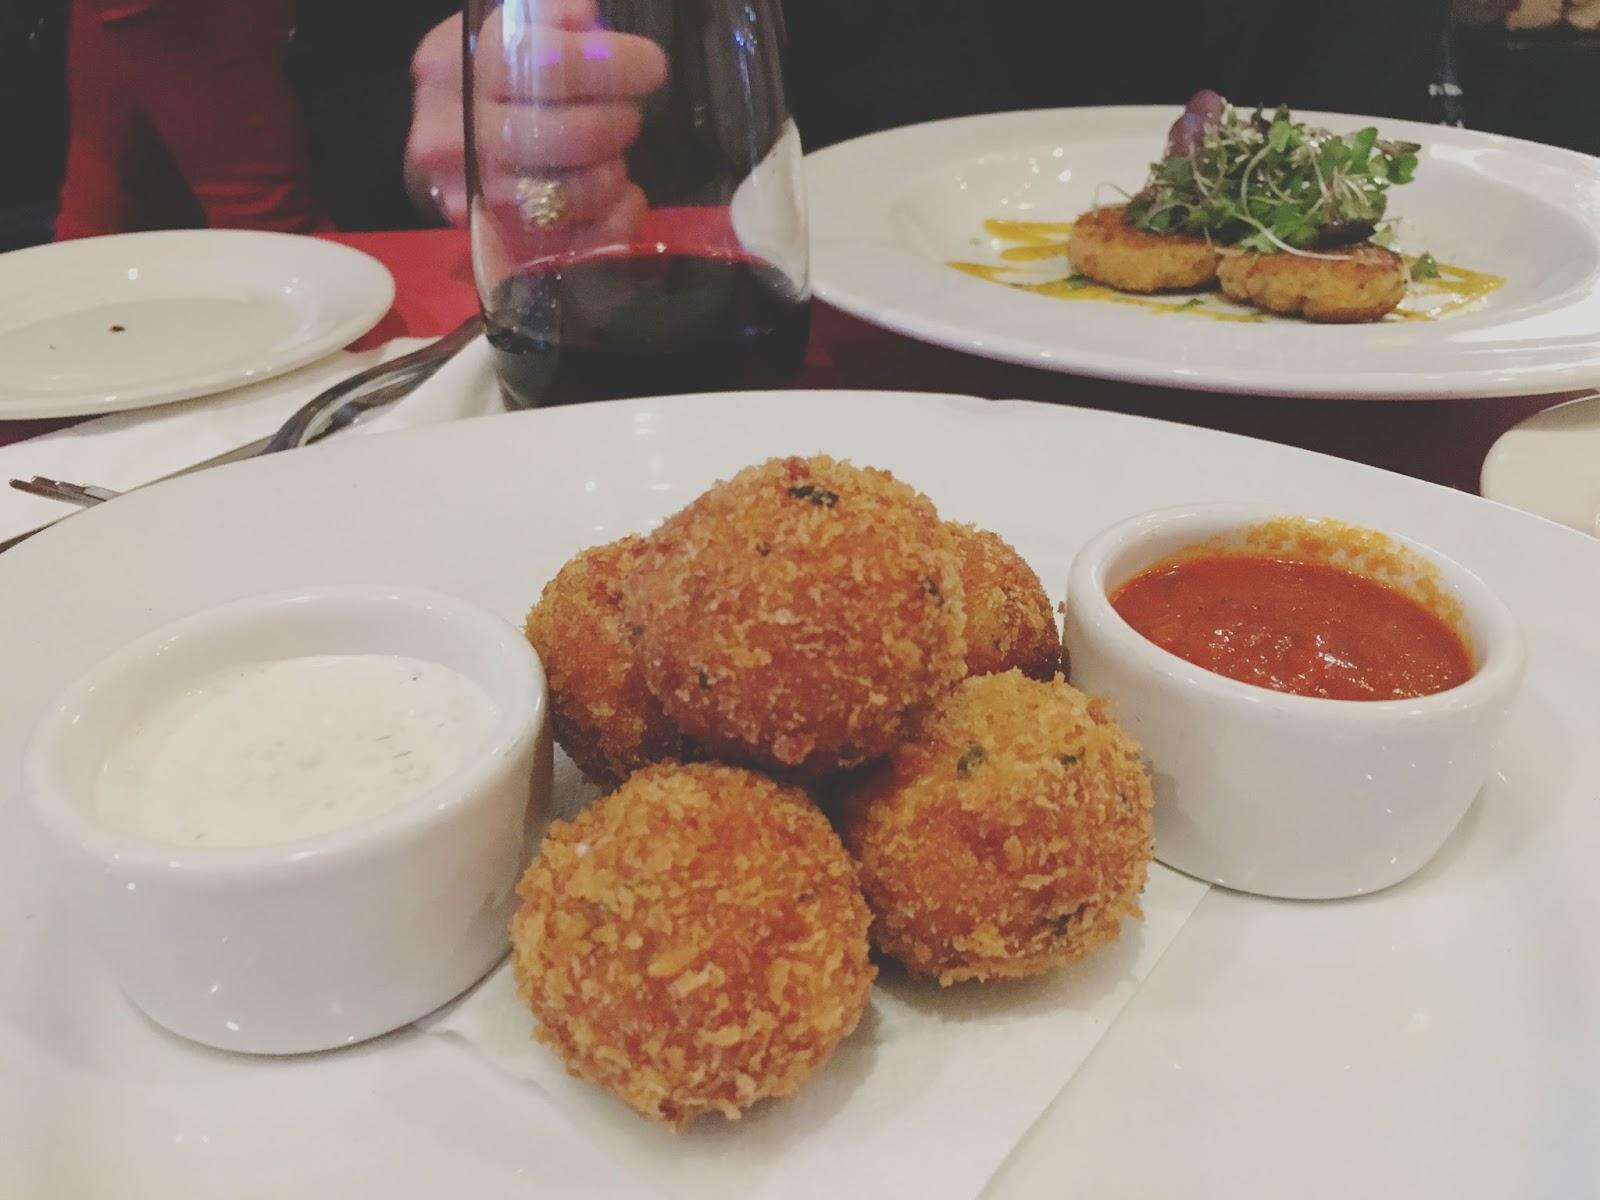 fried mozzarella balls at Emmy's Spaghetti Shack - a restaurant in San Francisco, California